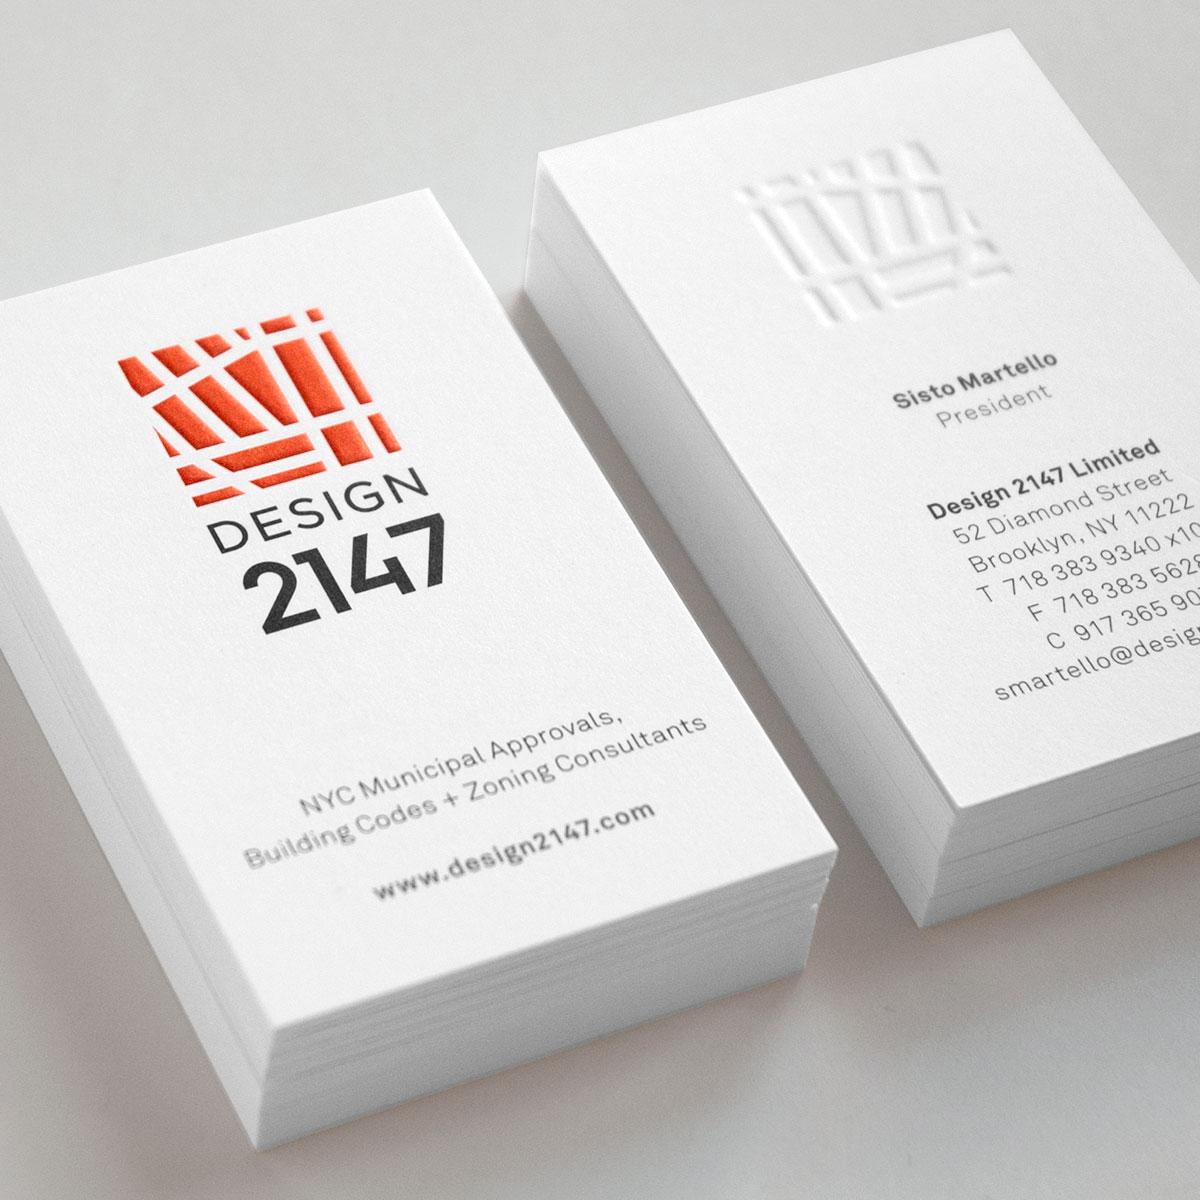 Design 2147 Logo